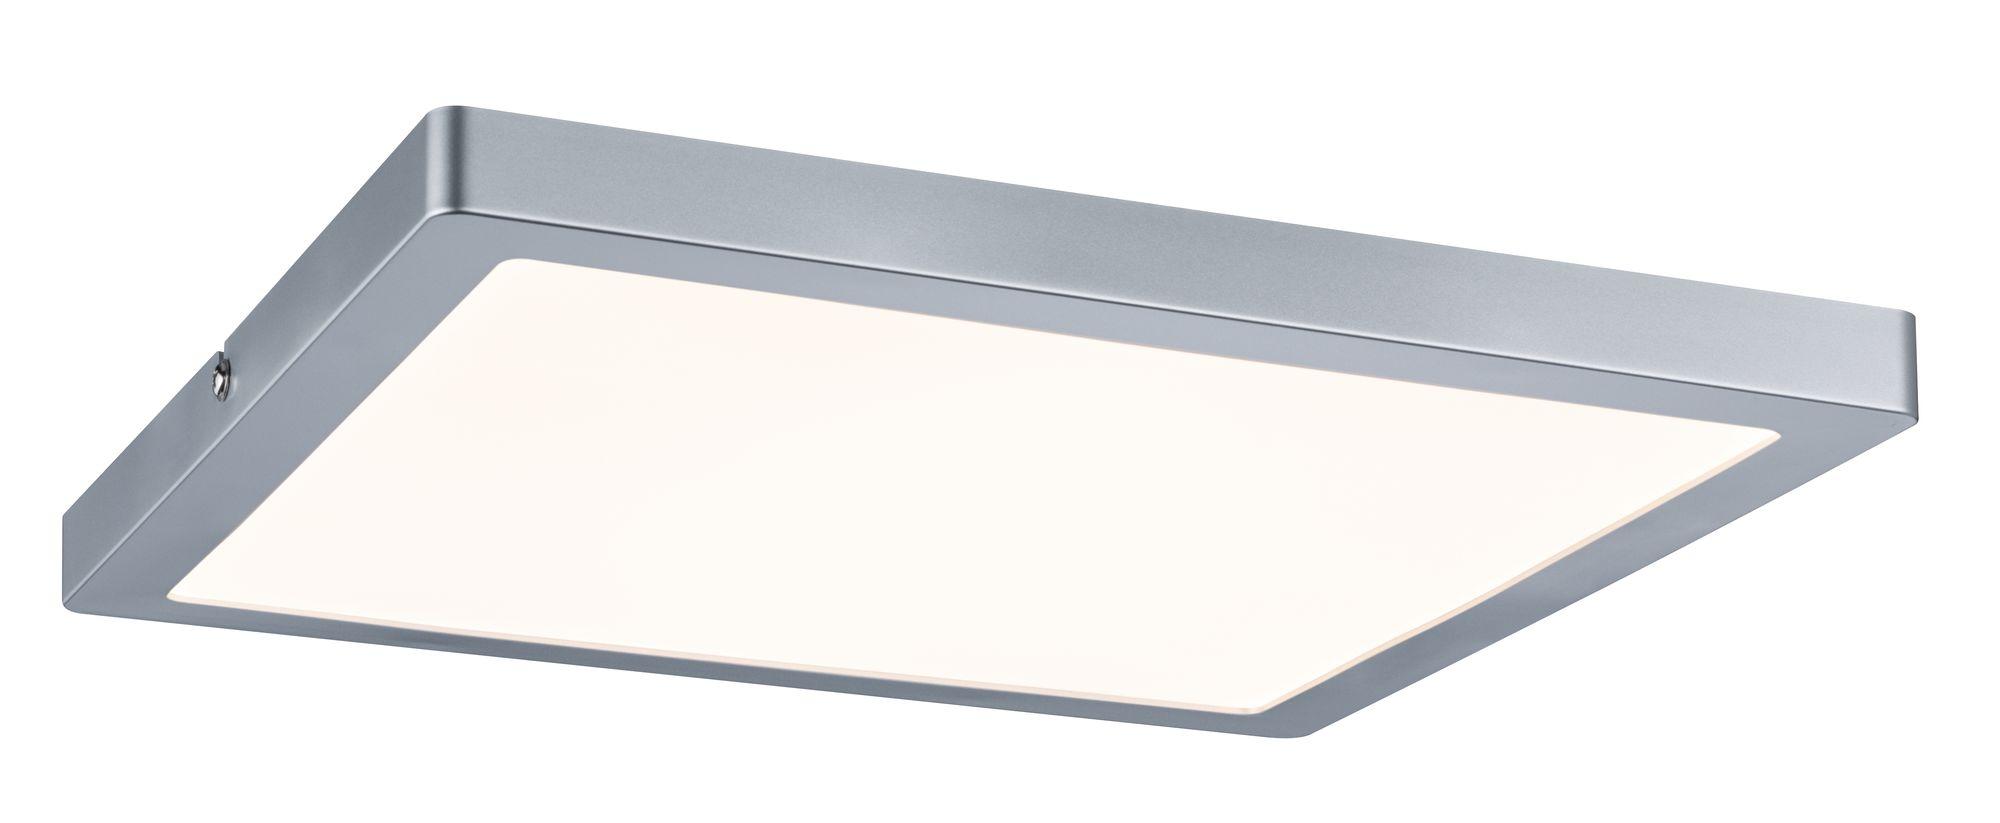 wand deckenleuchte atria led panel eckig  chrom matt